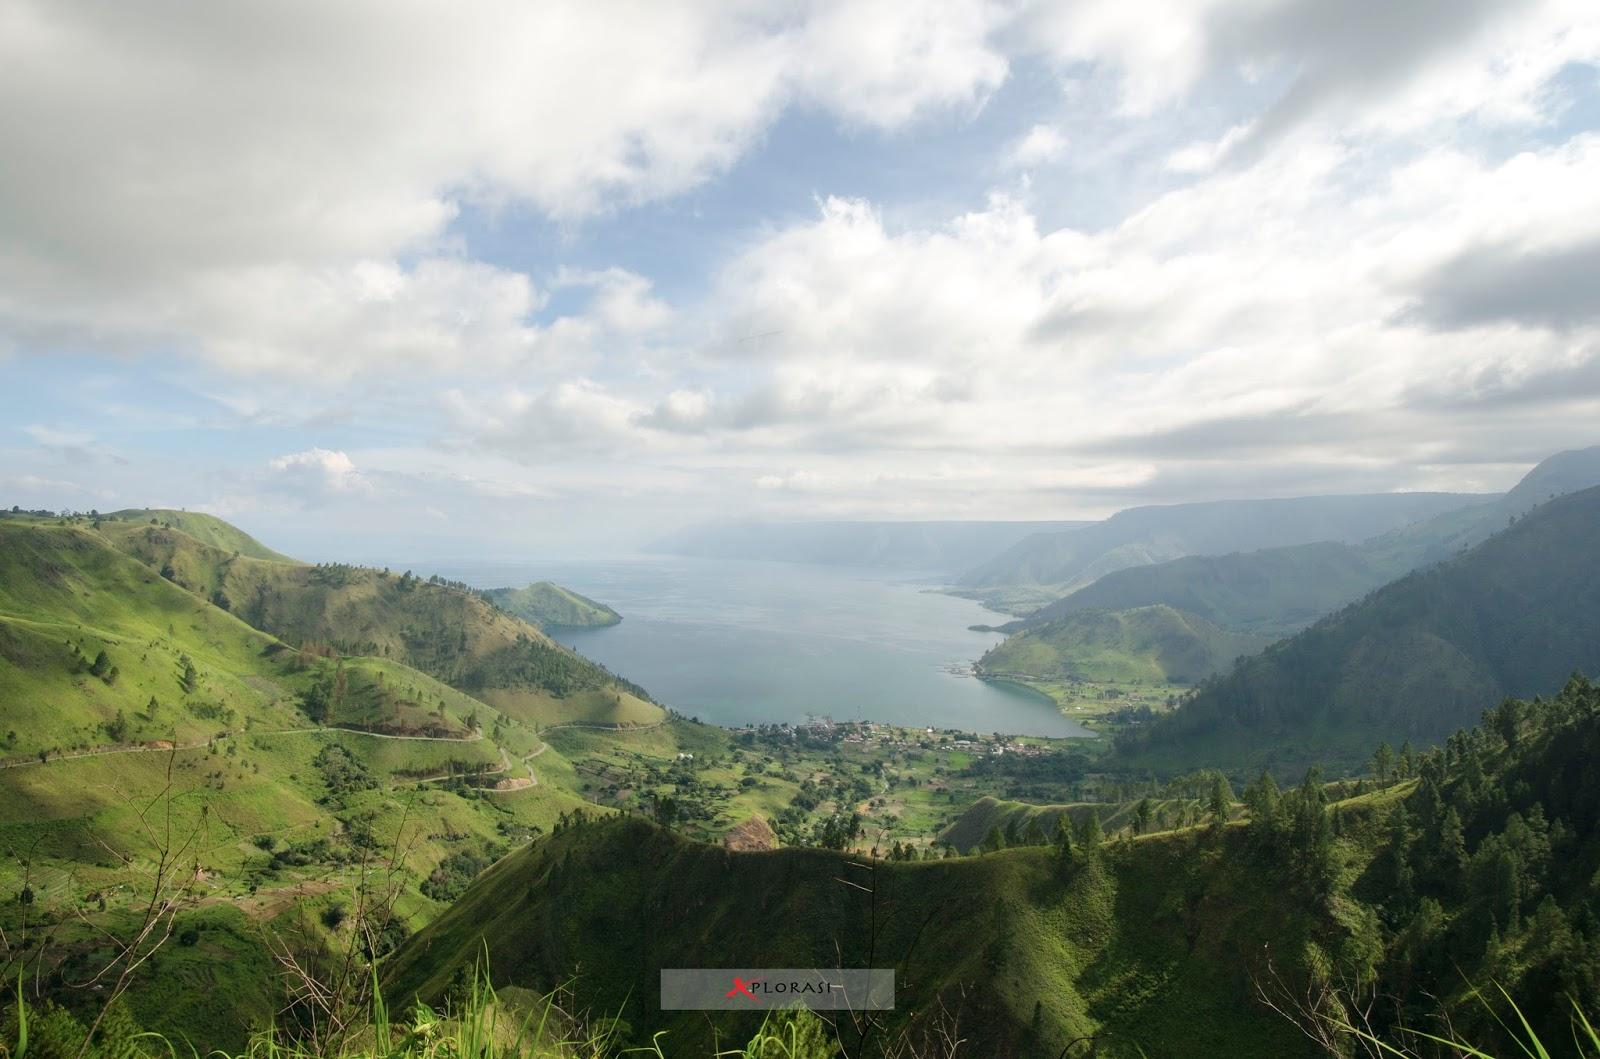 Xplorasi Keindahan Danau Toba Sebagai Ikon Wisata Sumatera Utara